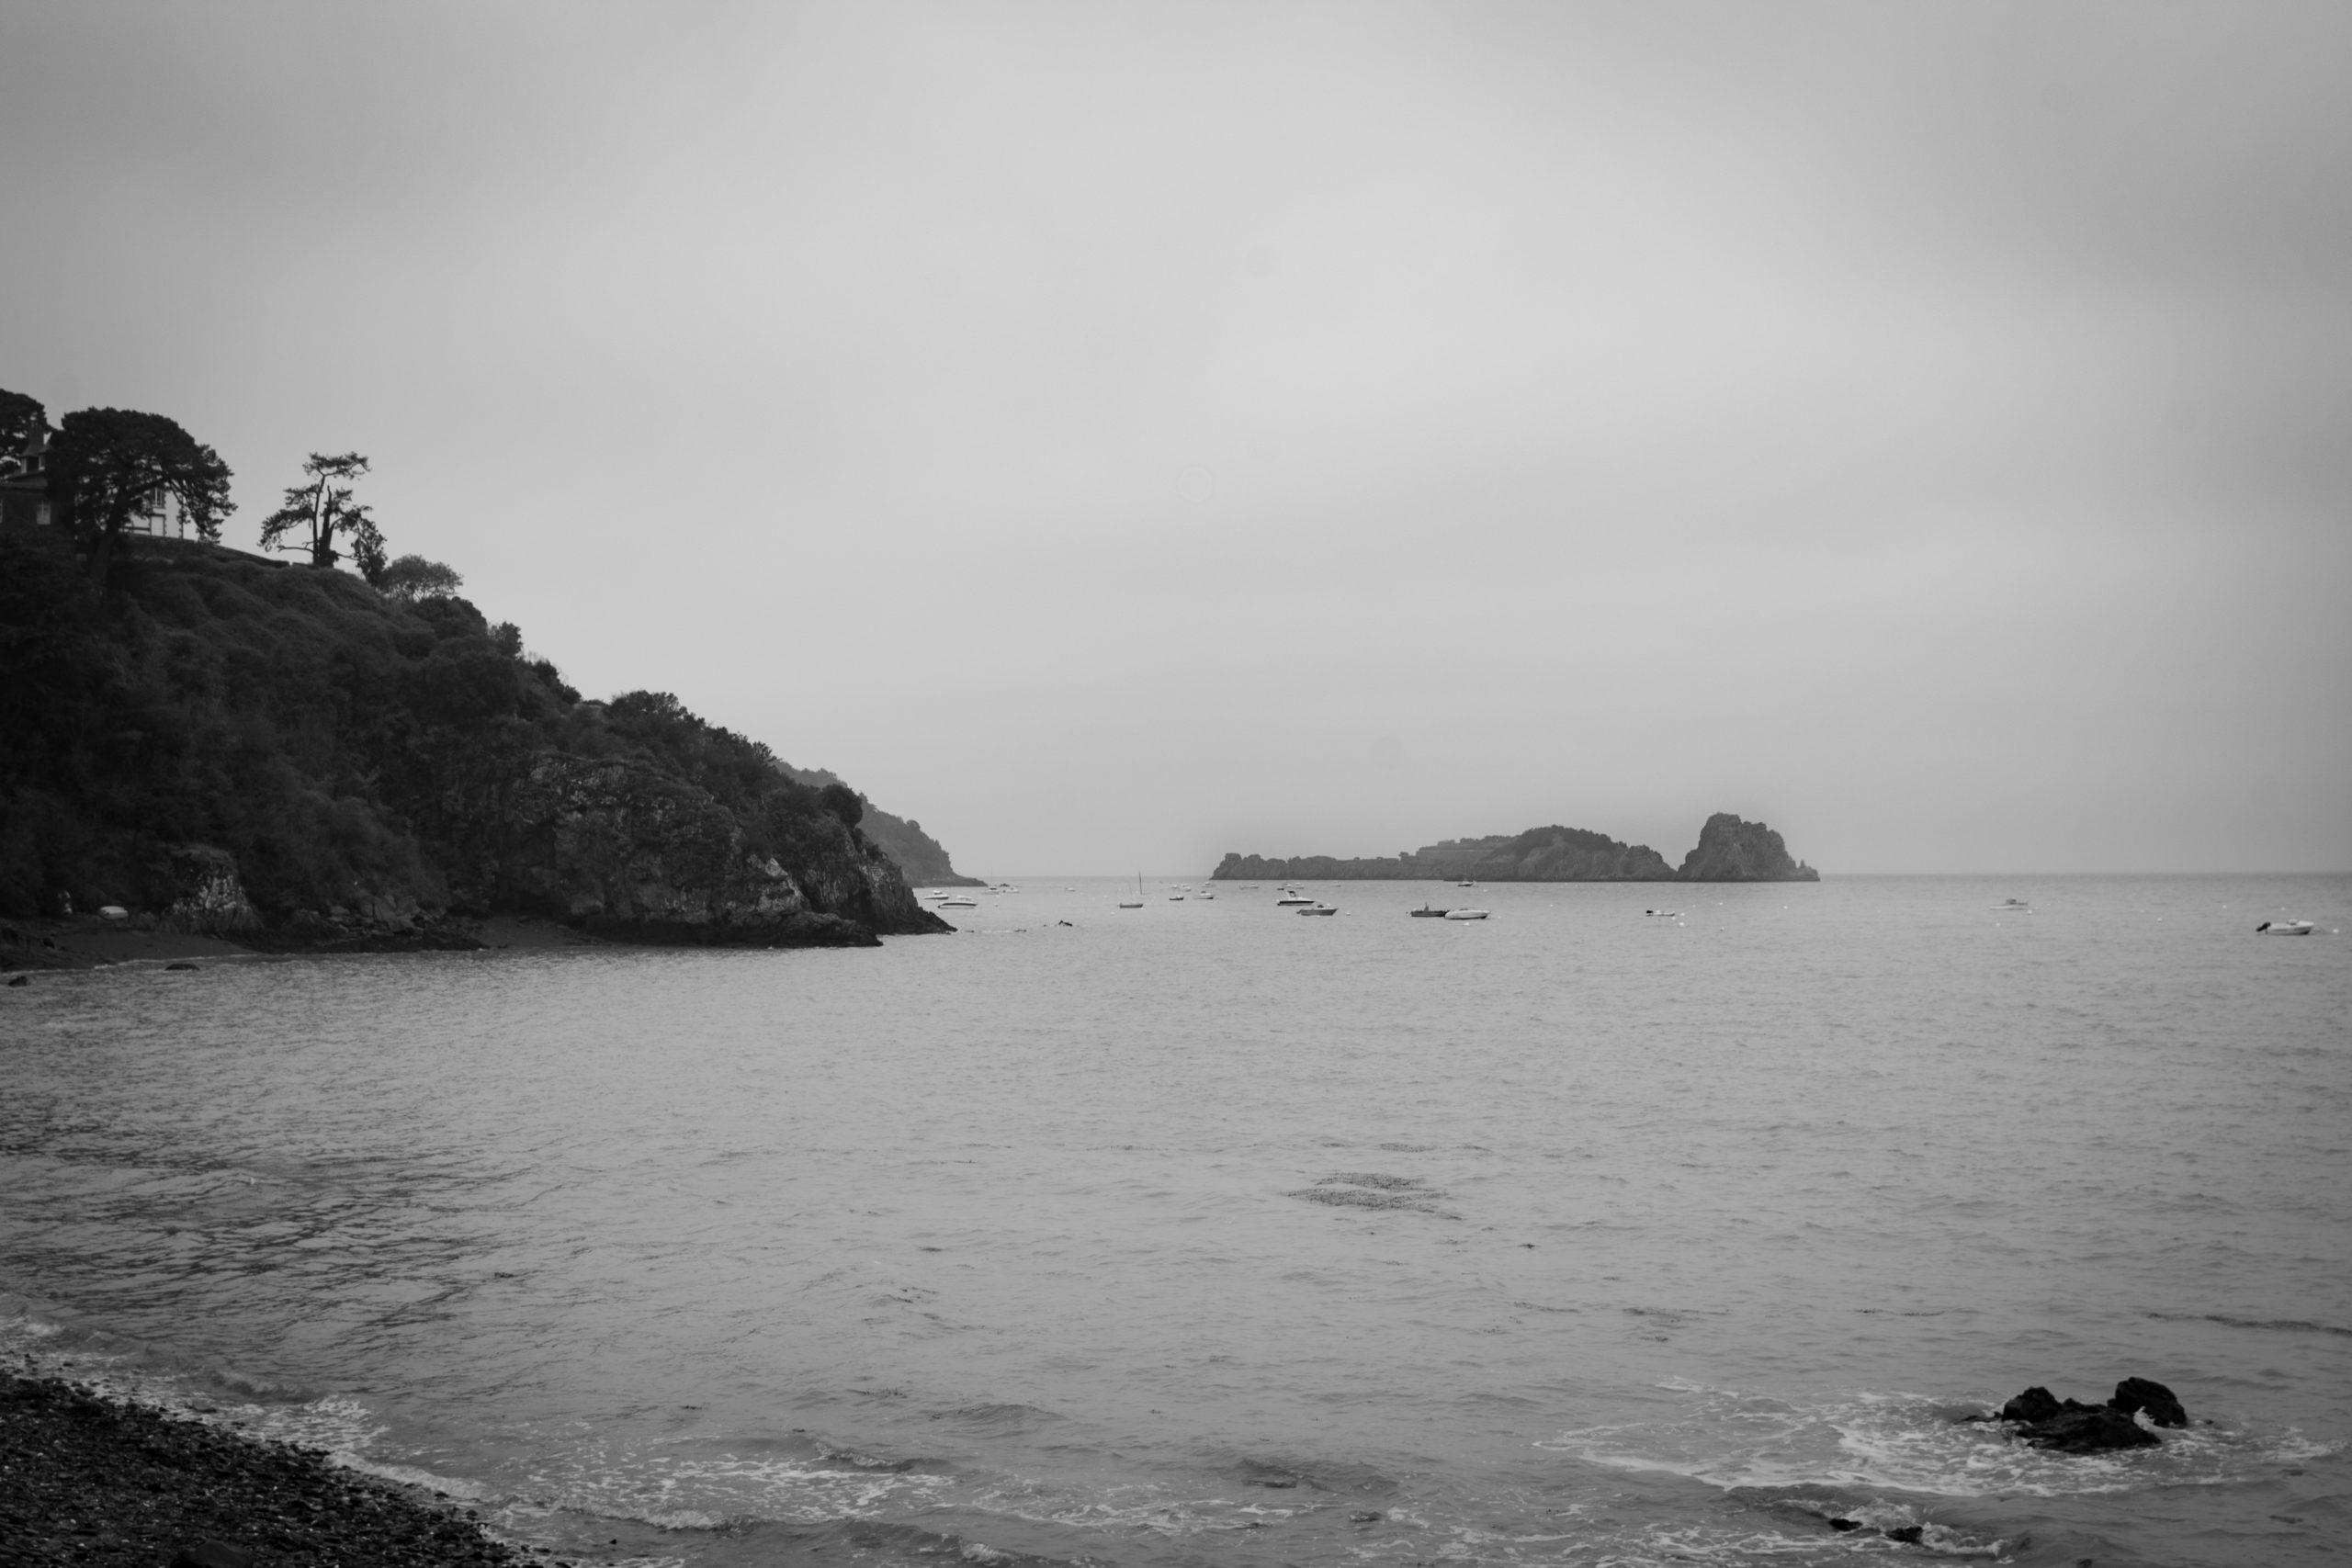 mer et rocher